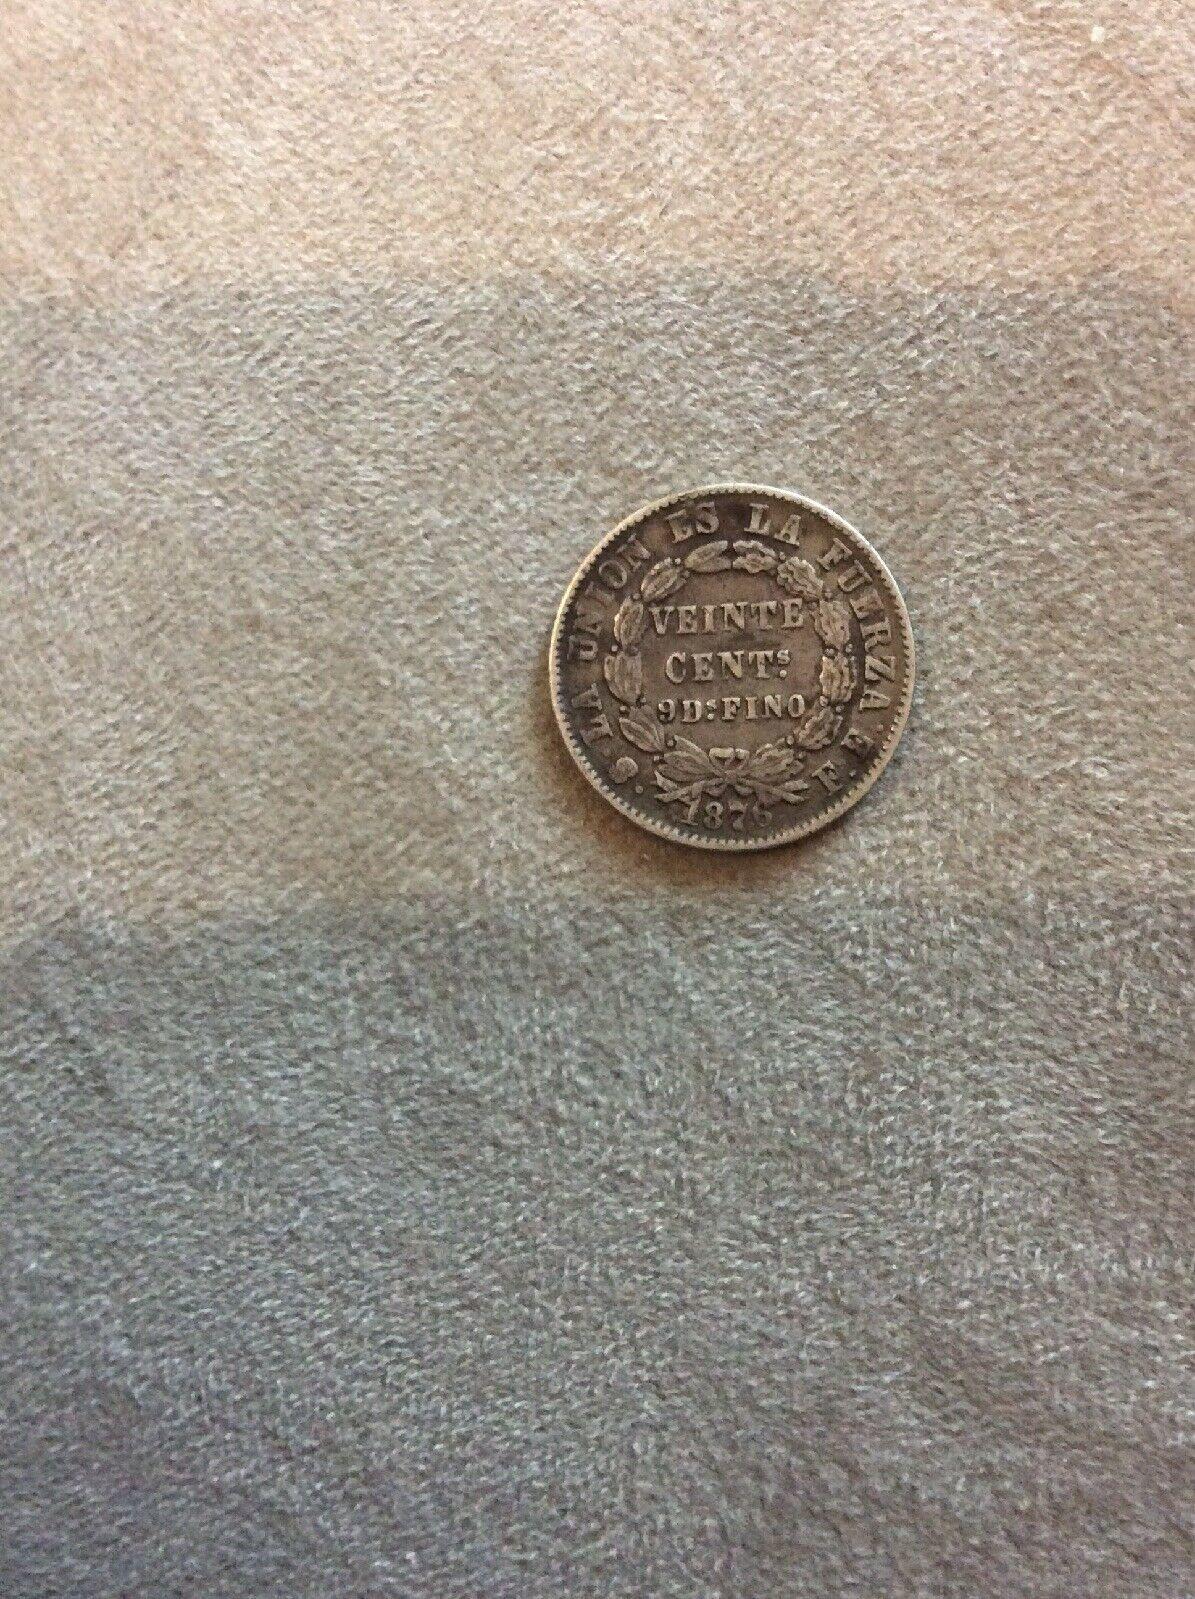 Bolivia 1876 020 Plata Coin